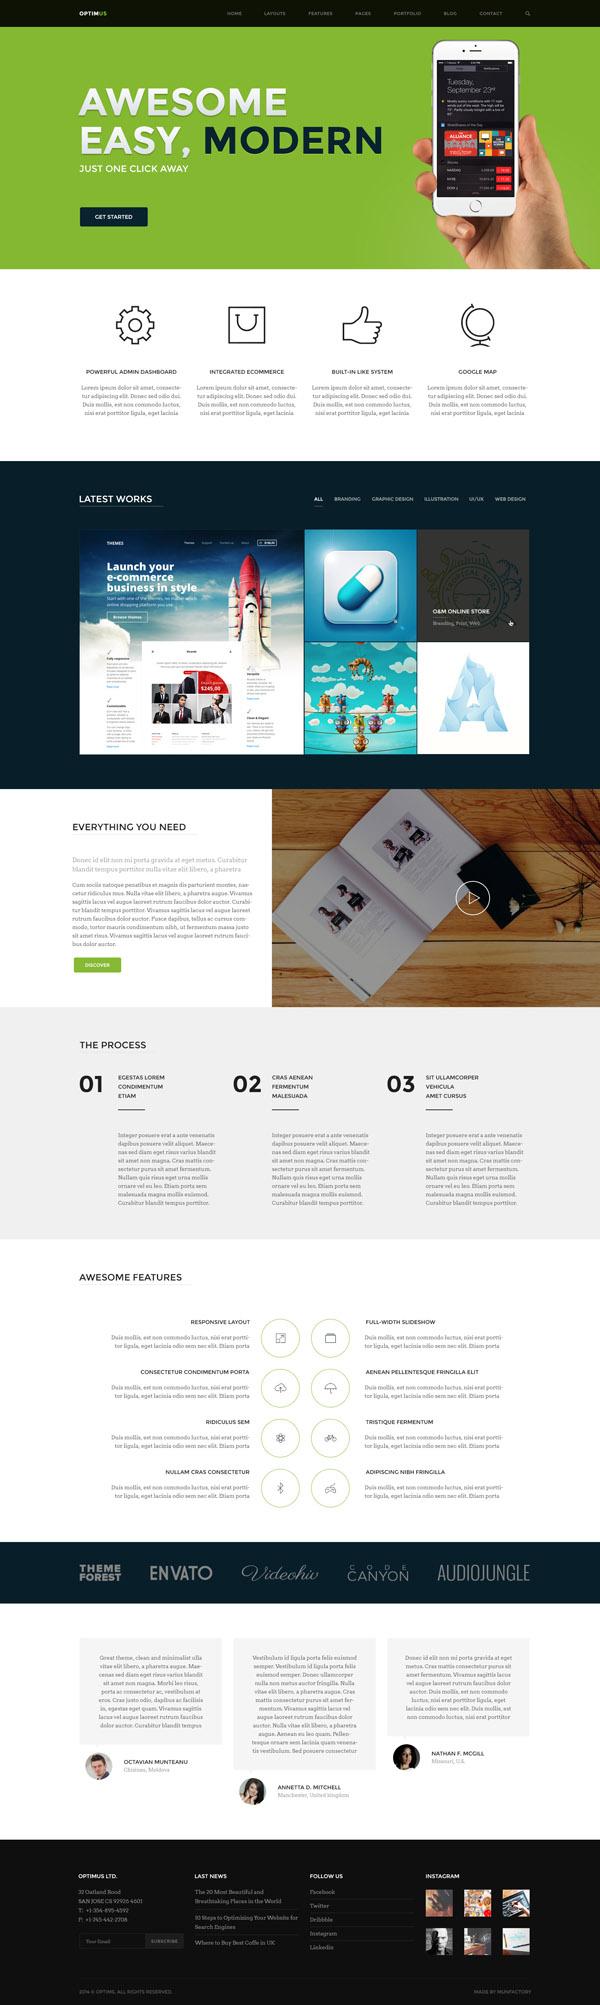 Optimus – A Super Easy to Use Multi-Concept HTML5